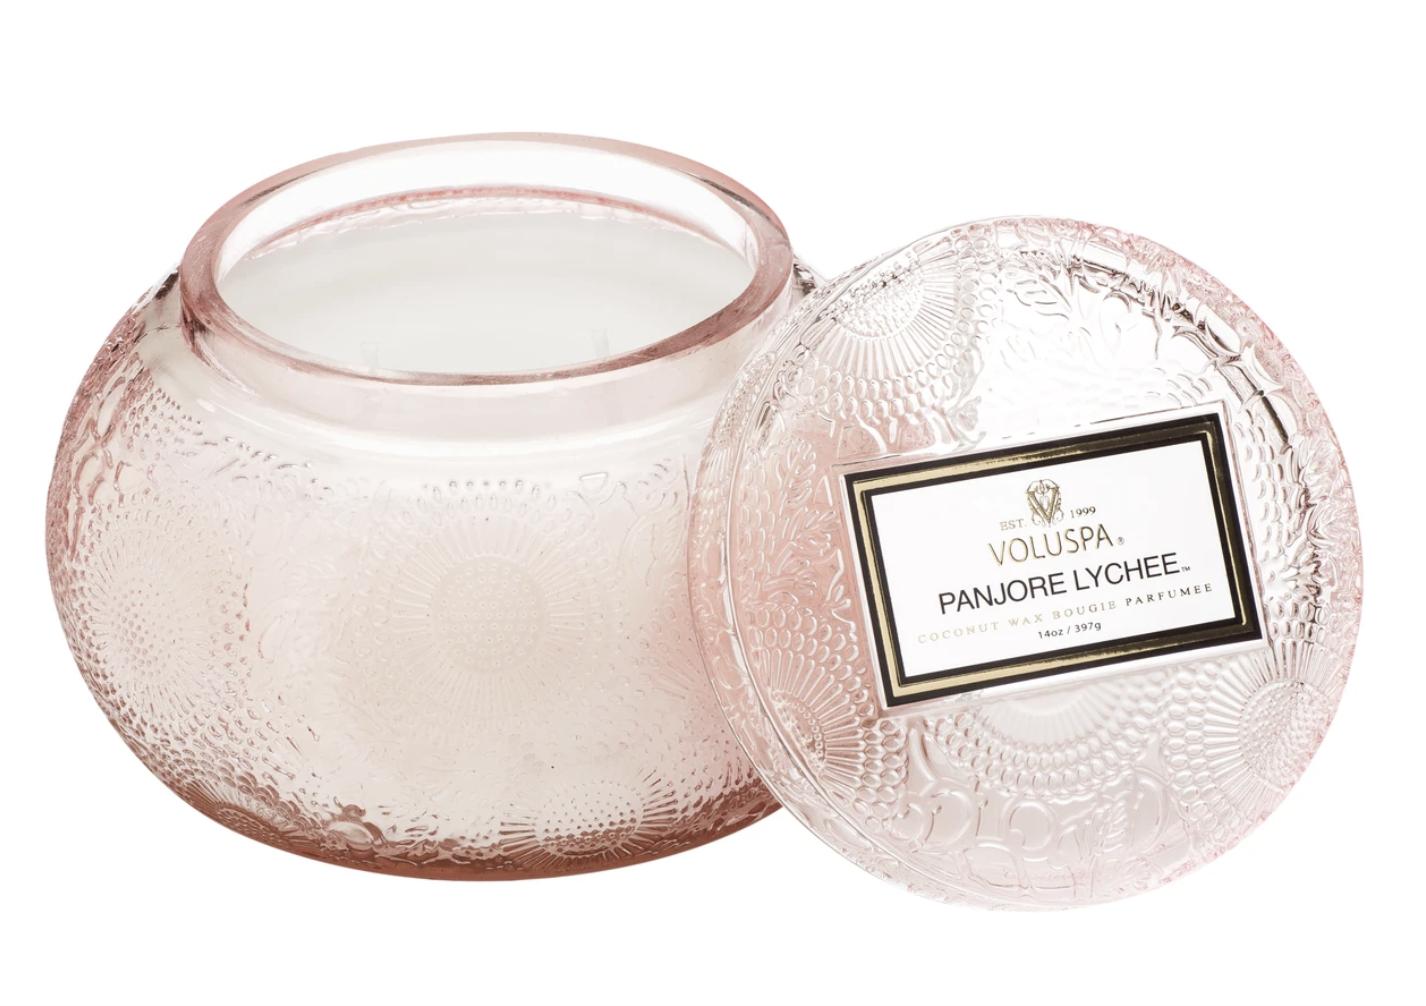 Voluspa Panjore Lychee, Glass Chawan Bowl Candle